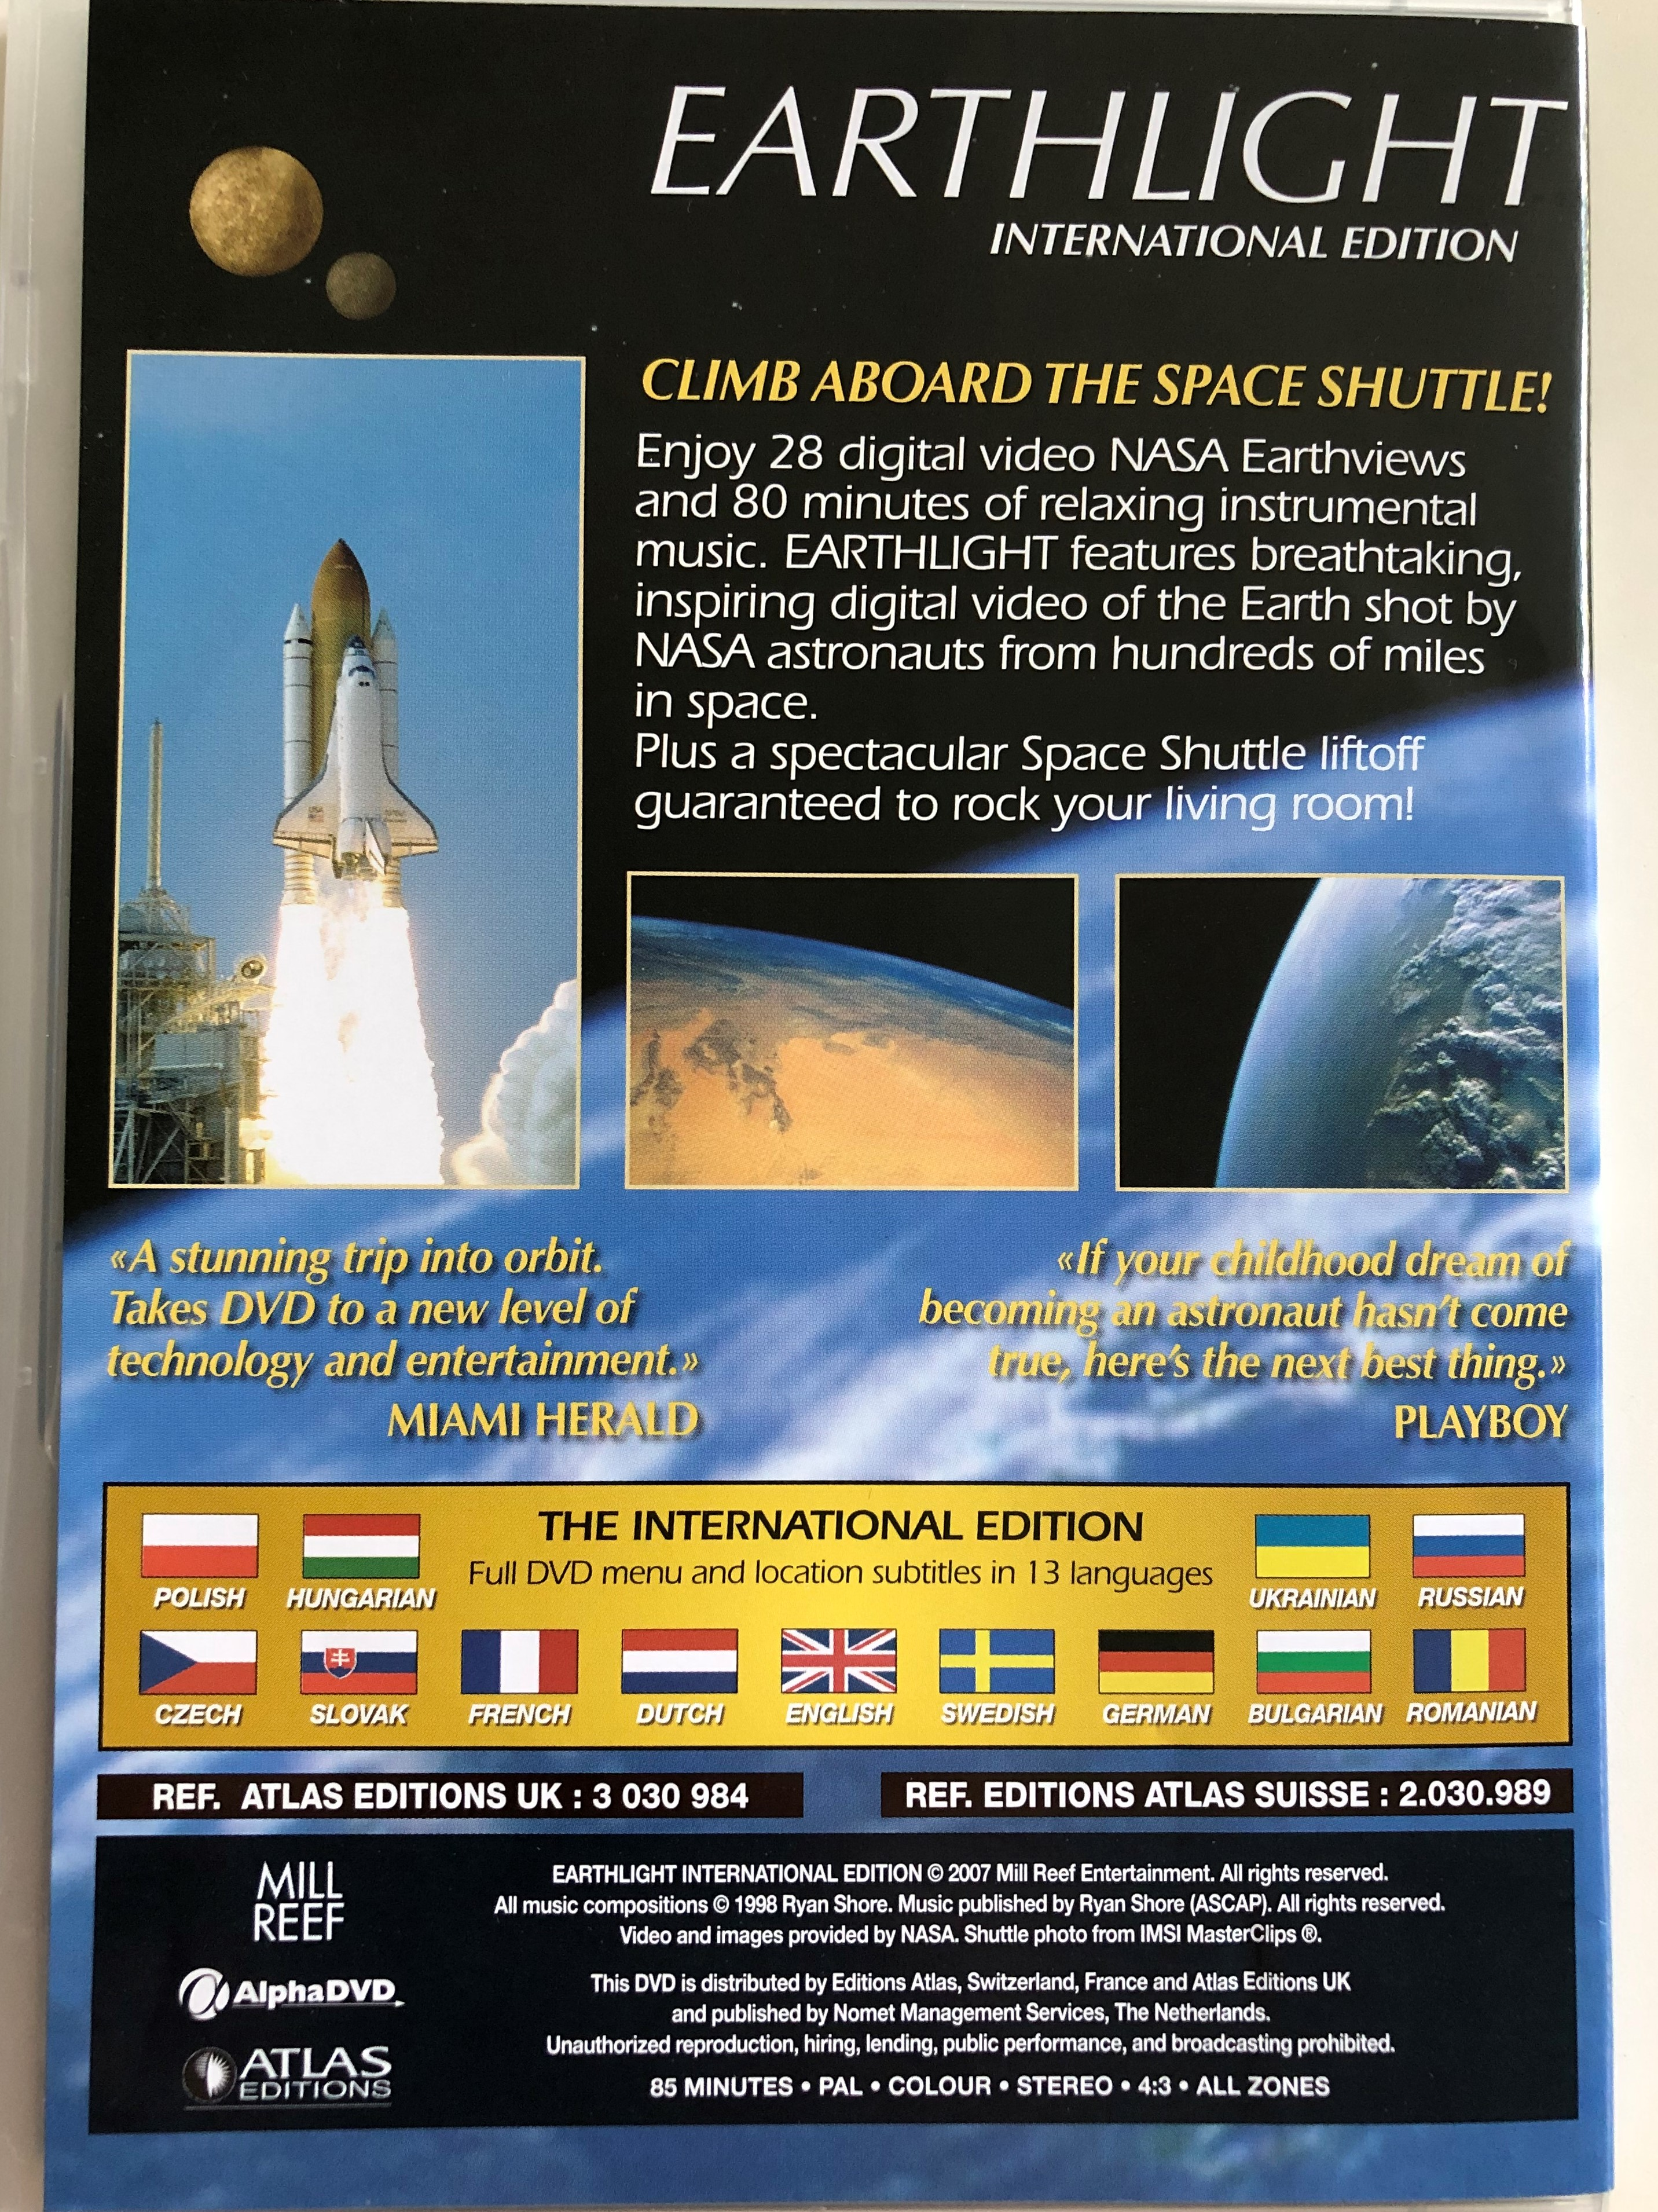 earthlight-internation-edition-dvd-2007-an-astronaut-s-view-of-planet-earth-28-digital-video-nasa-earthviews-multi-language-polish-hungarian-french-english-german-russian-romanian-dutch-czech-swedish-atlas-edit.jpg